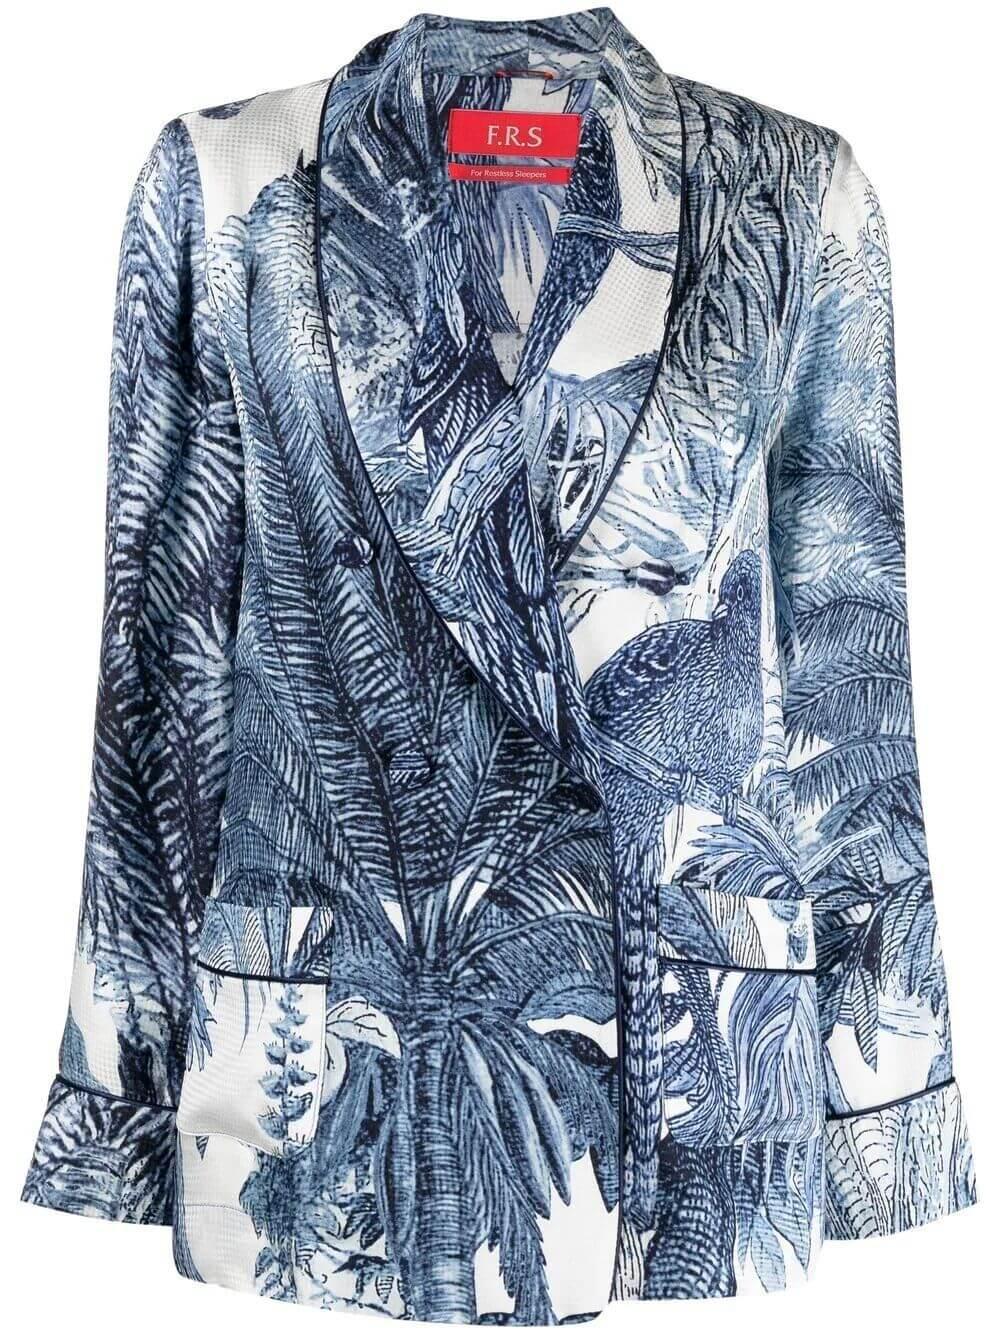 Palm Print Jacket Item # GA000314-TE00537-179